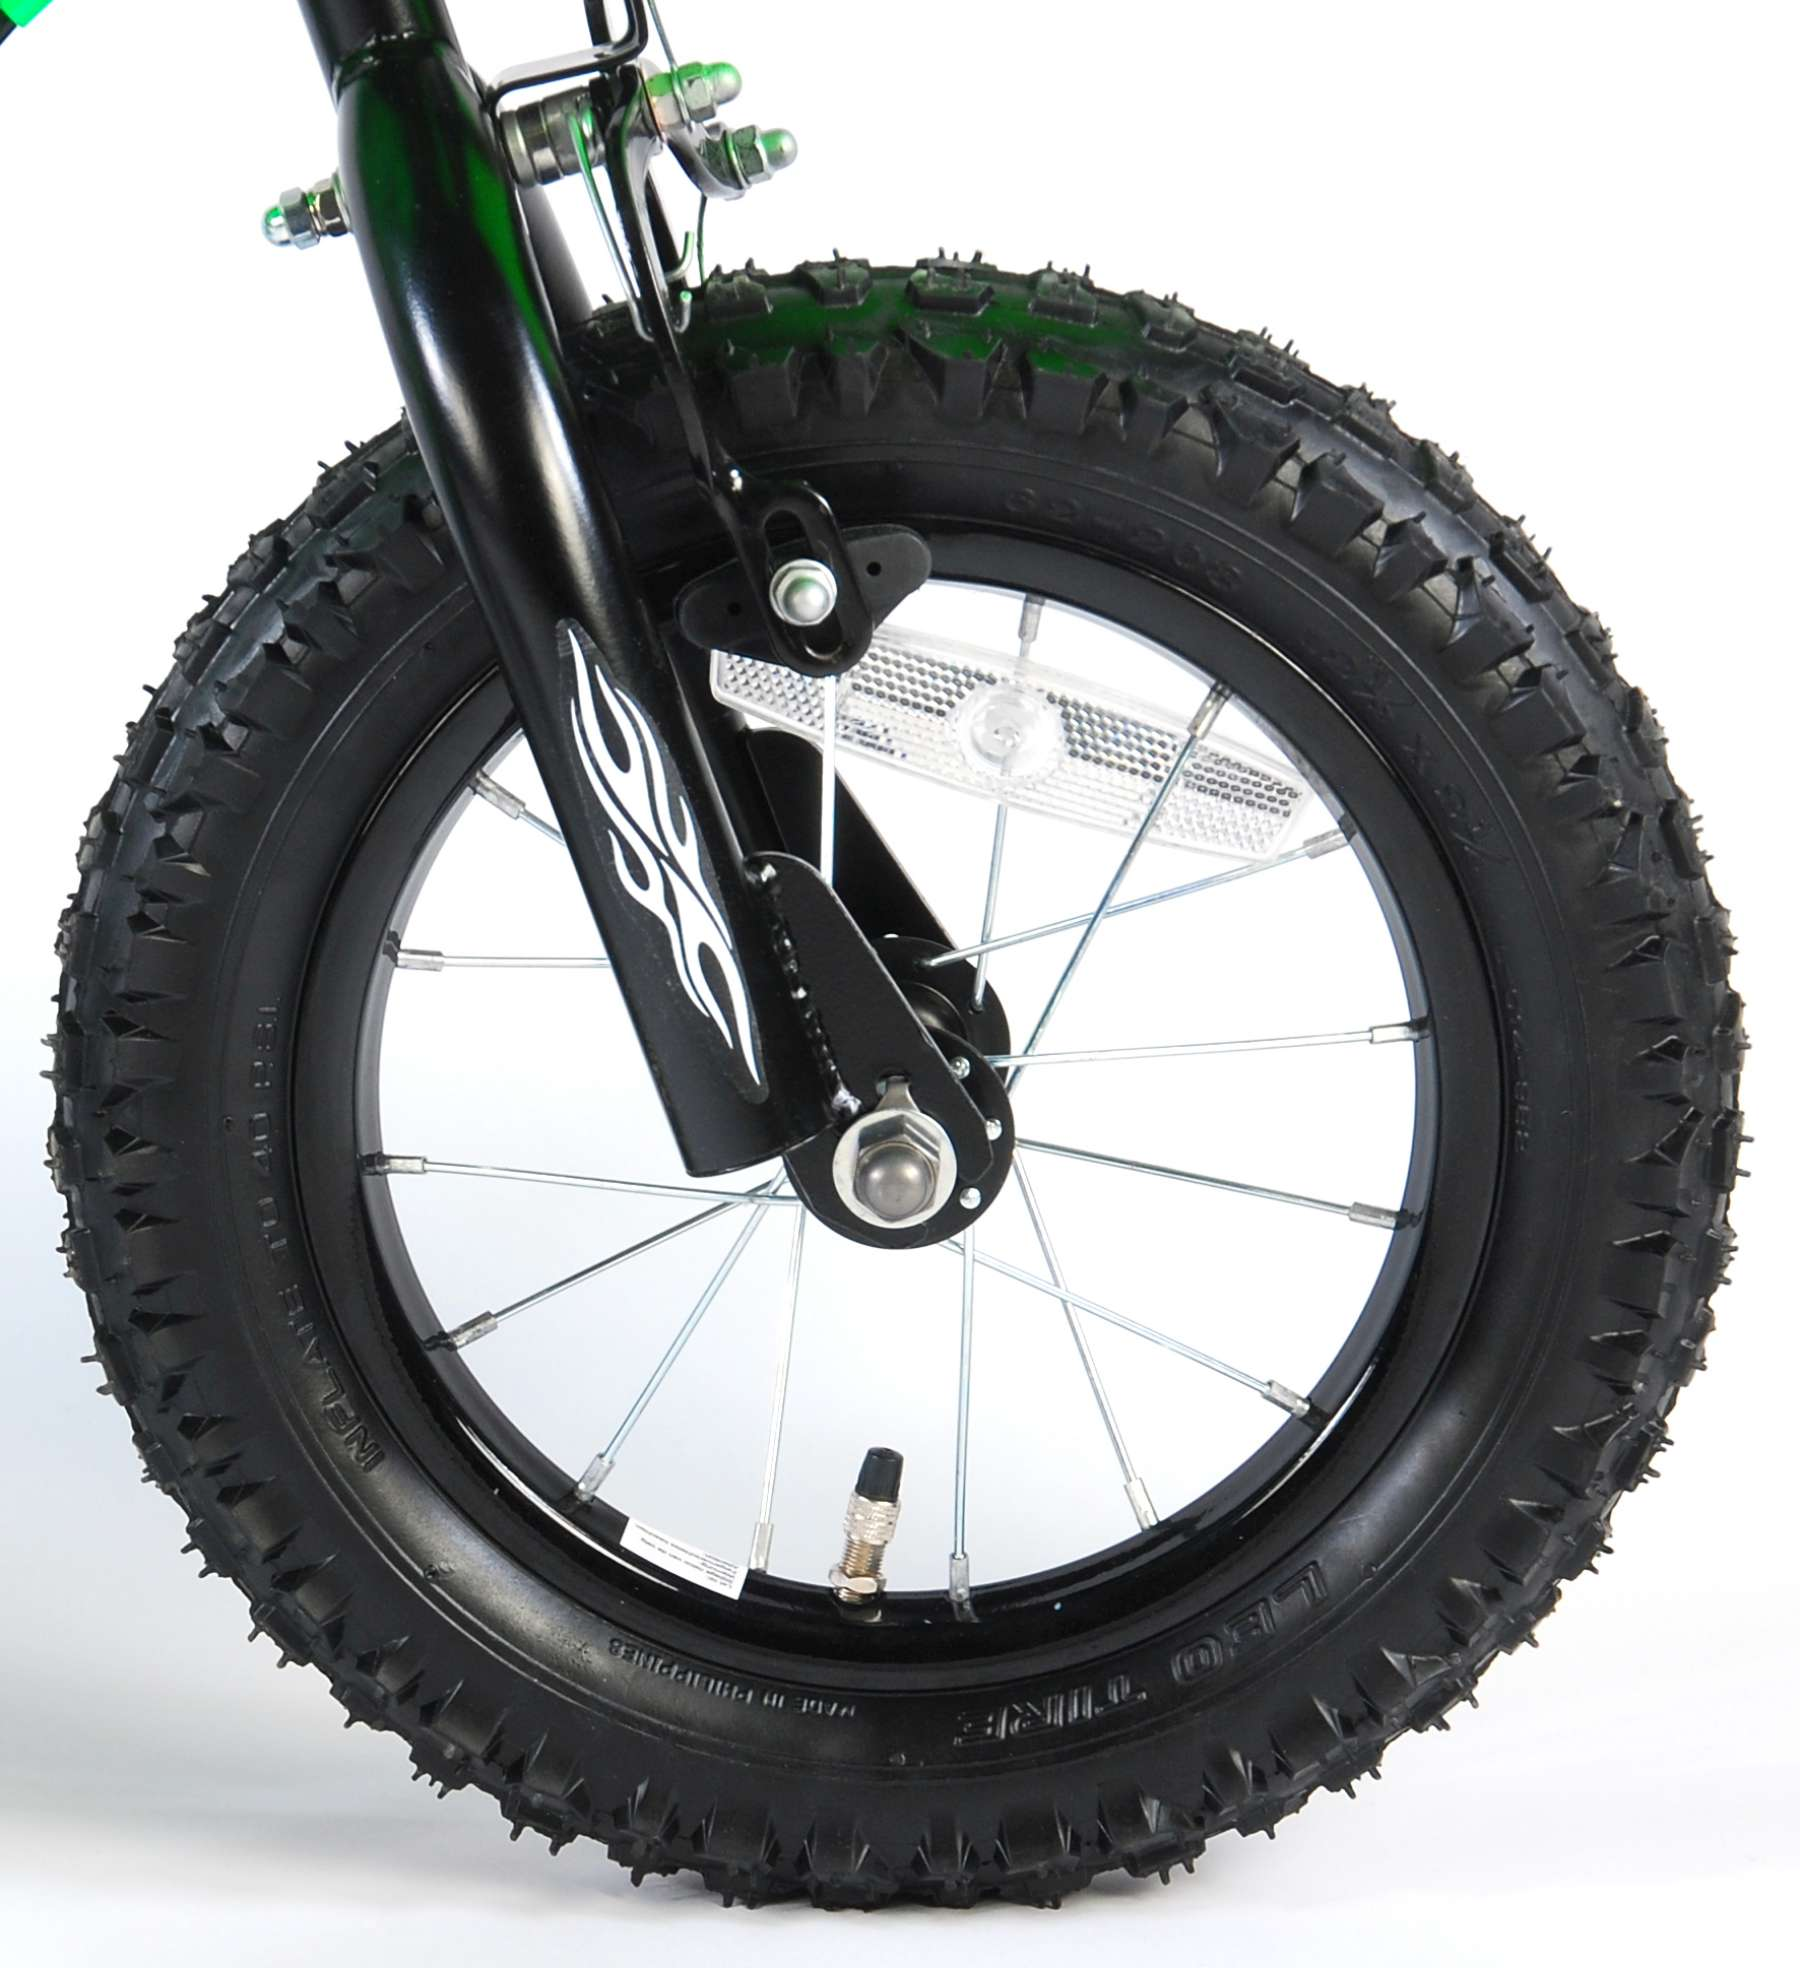 Bicicleta Motorbike de 12 pulgadas Verde - rueda delantera